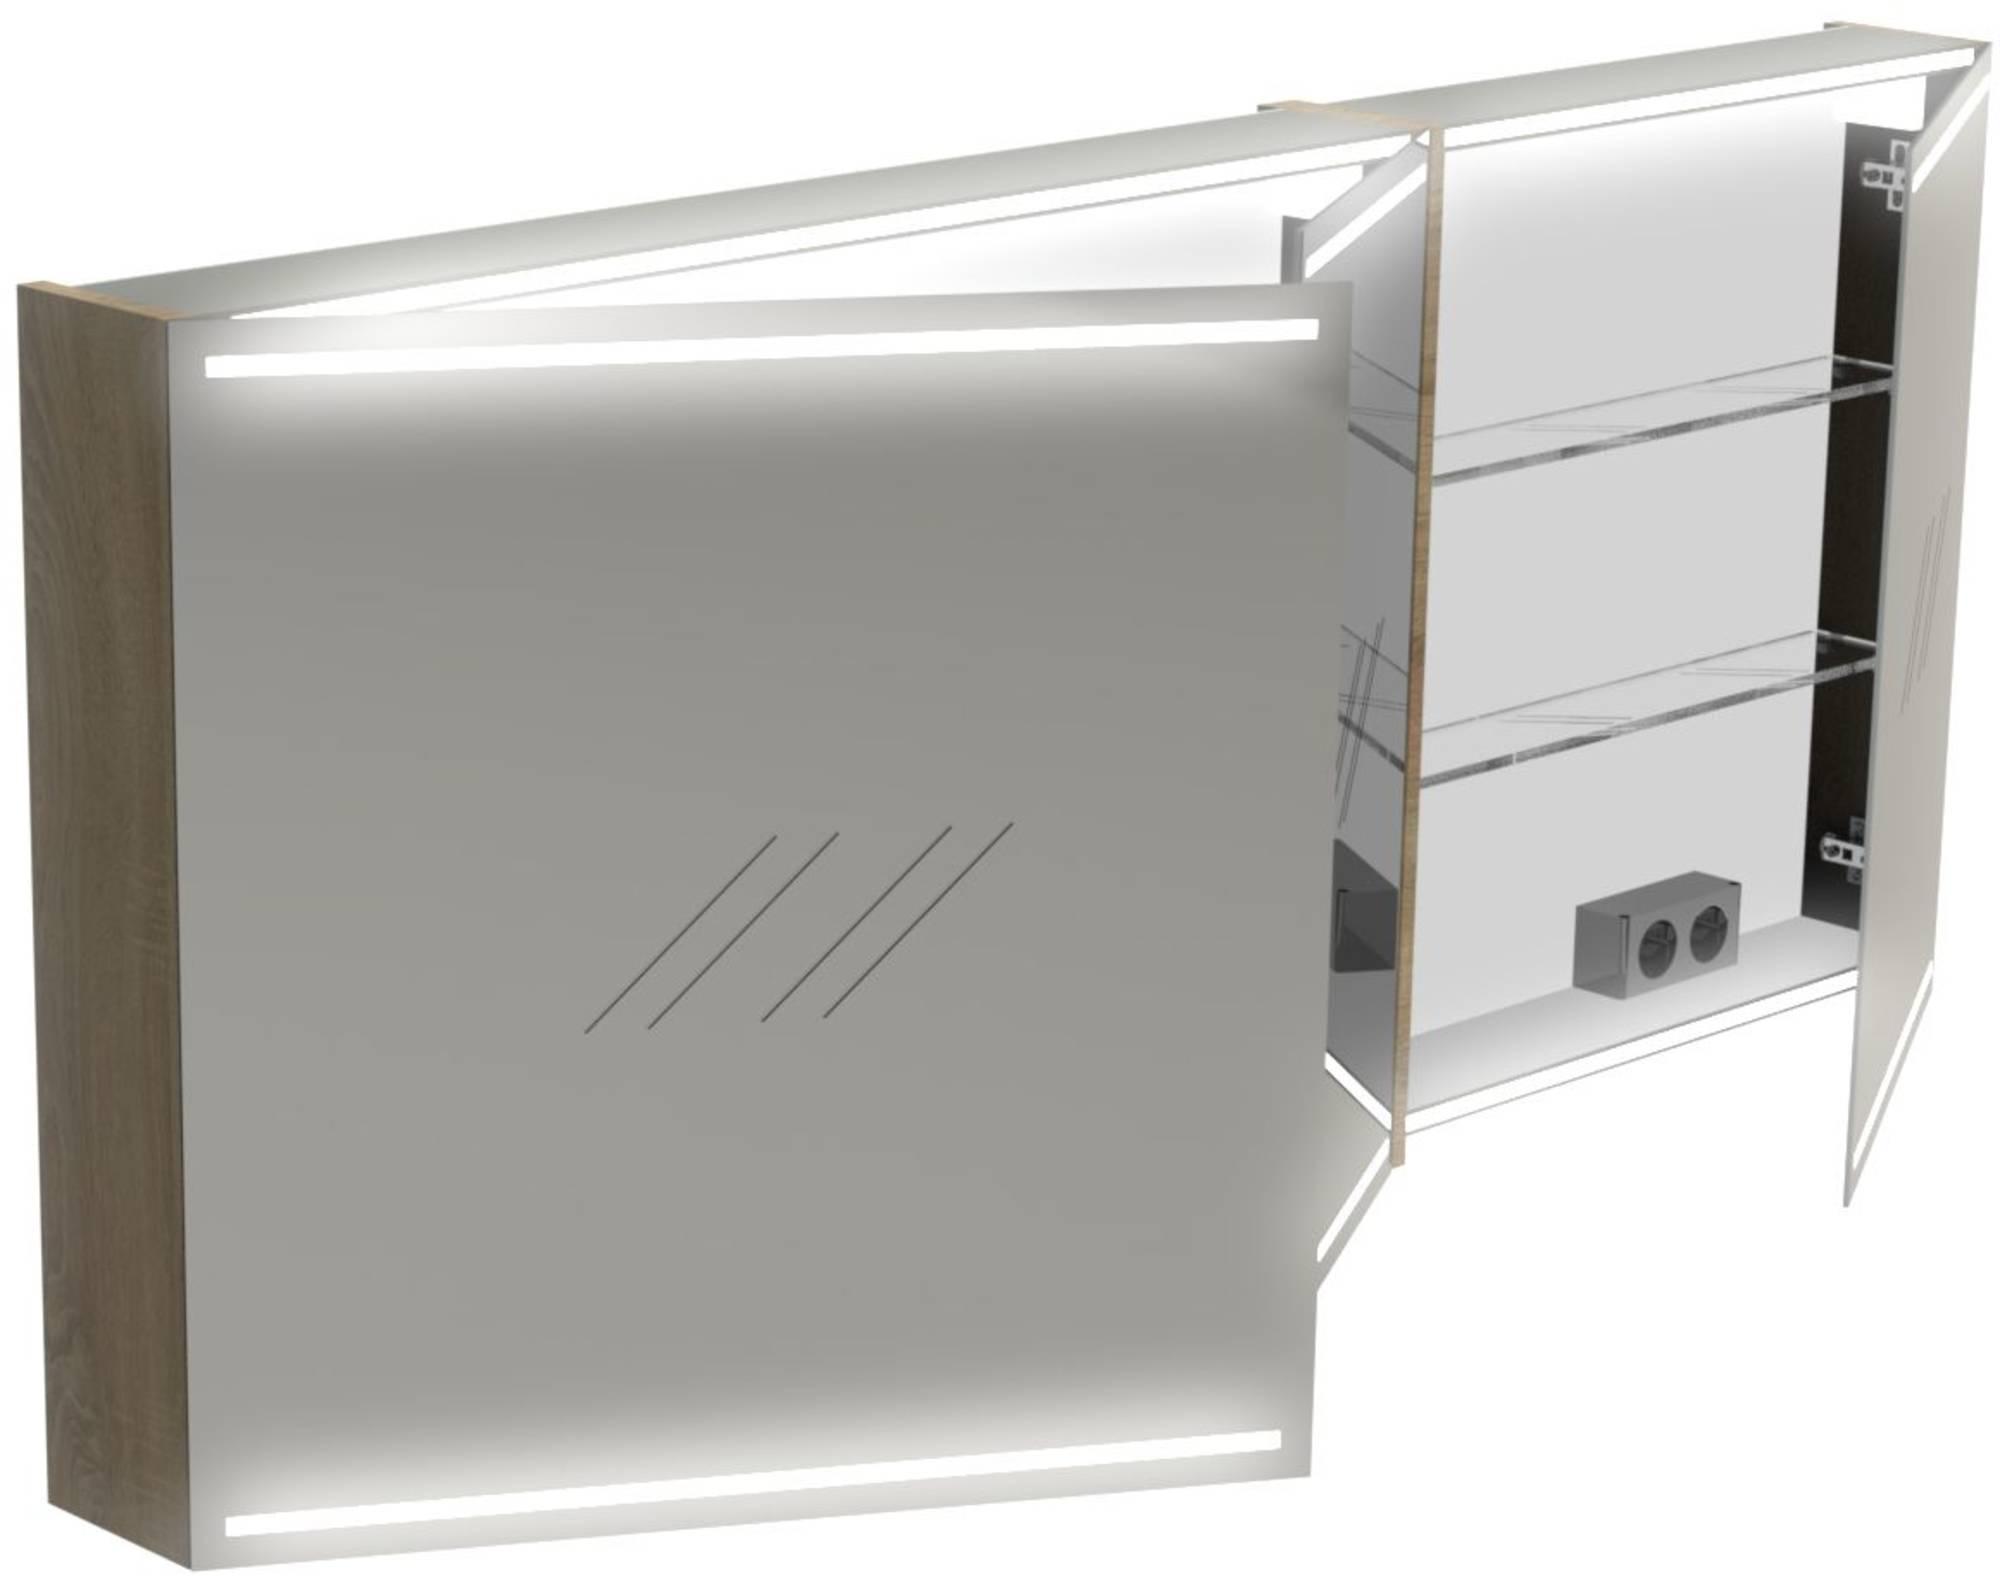 Thebalux Deluxe Spiegelkast 70x160x13,5 cm Mistral